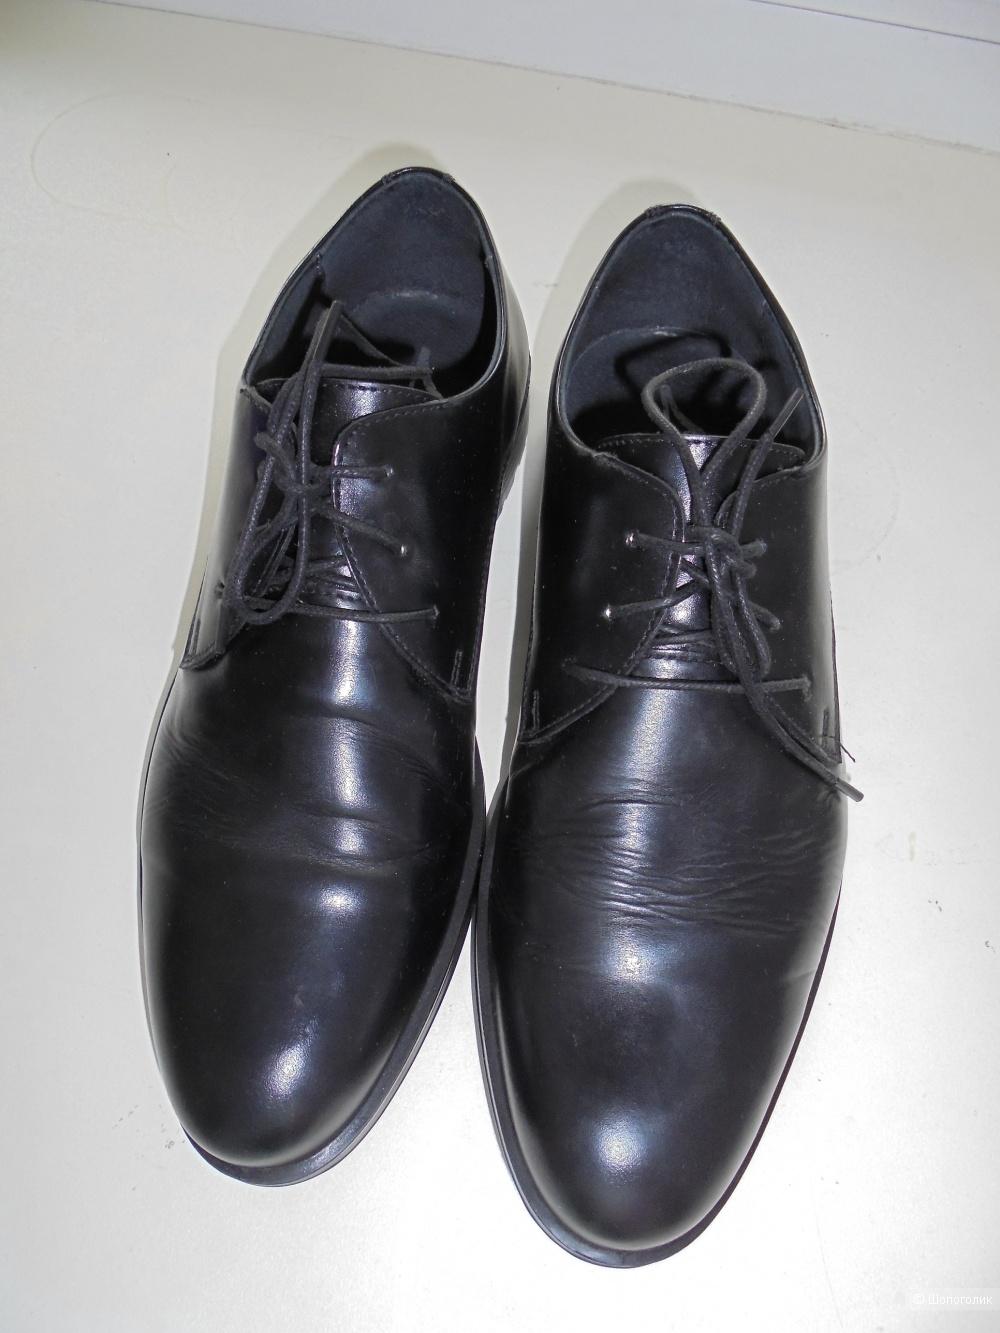 Ботинки мужские Марко, 39 размер.